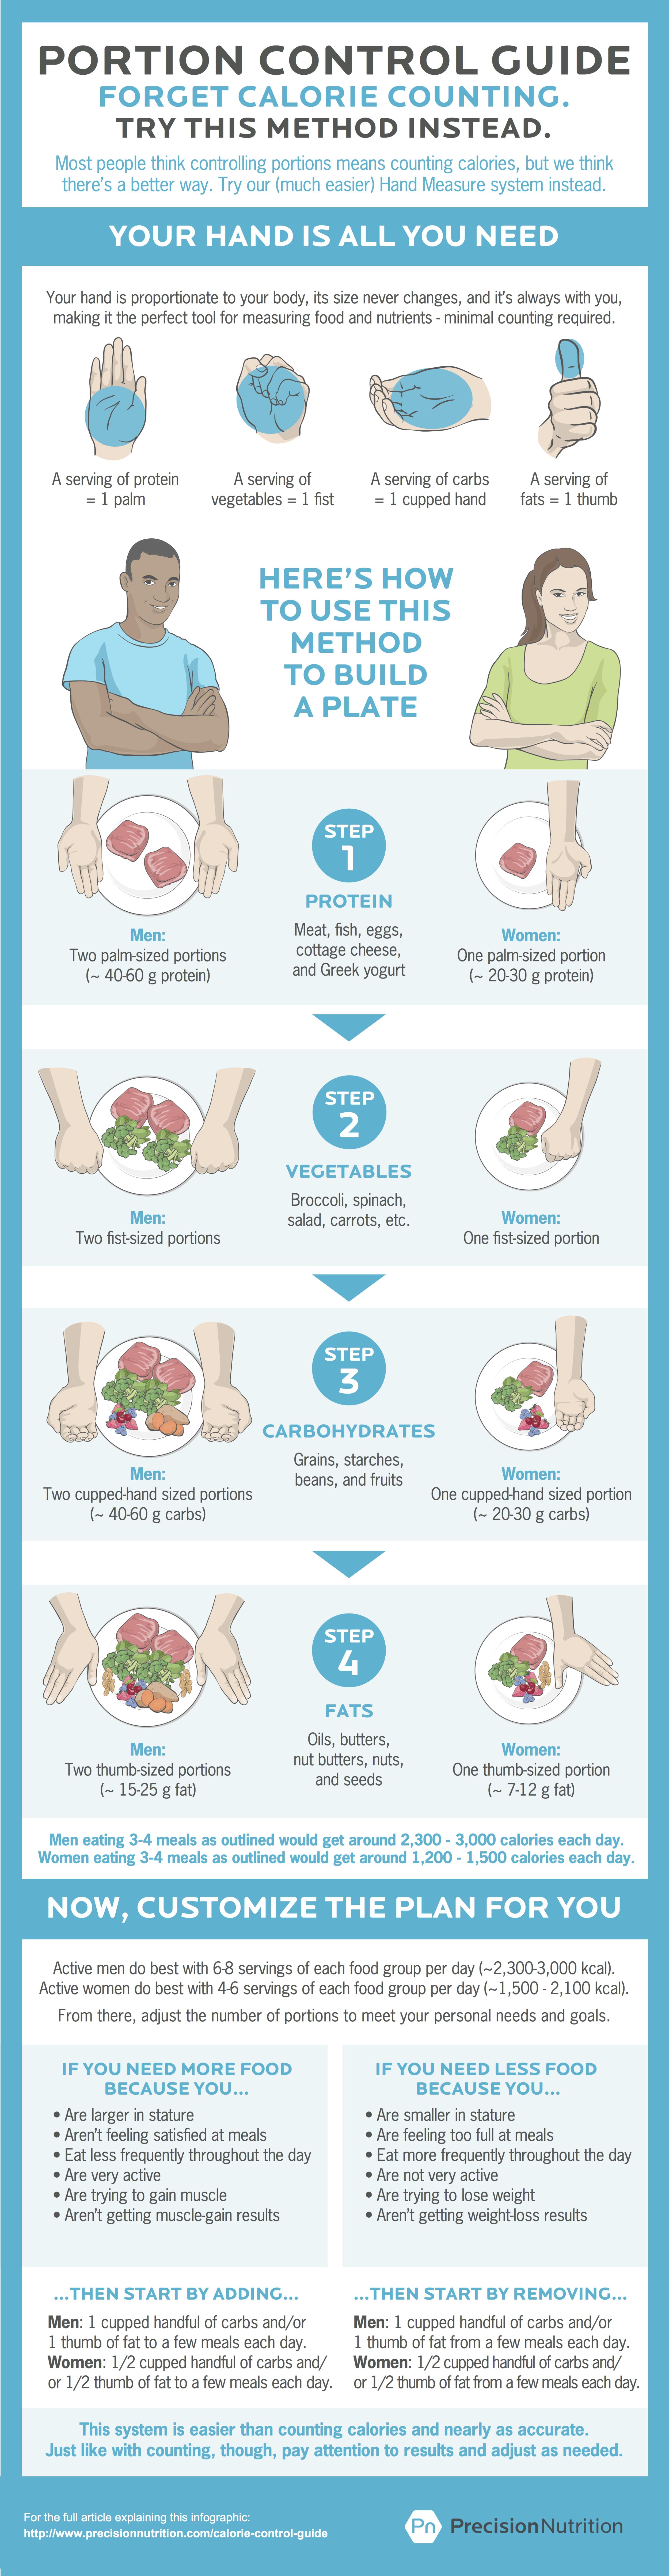 Image courtesy of   Precision Nutrition